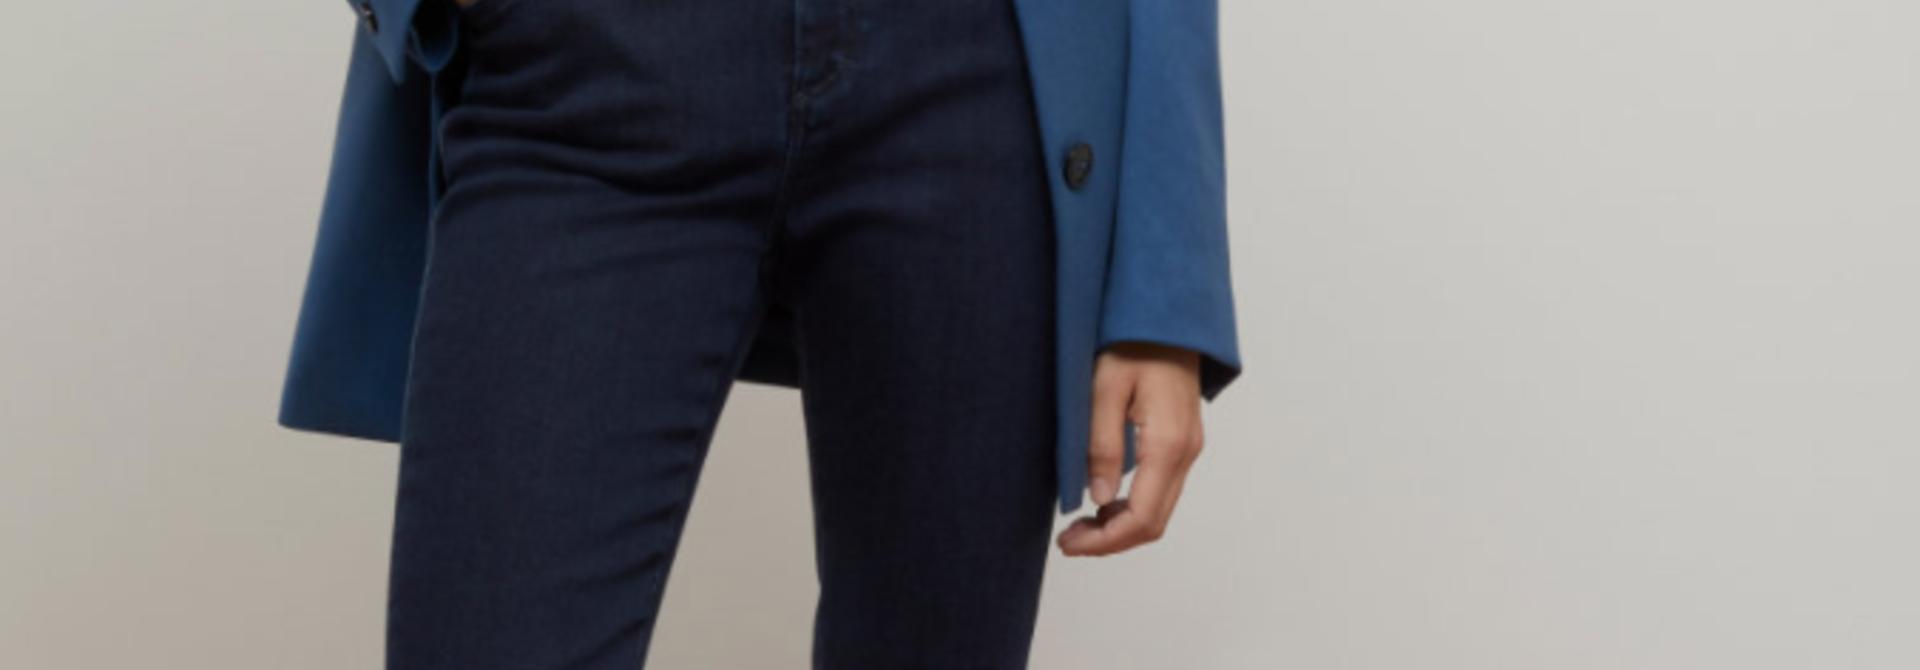 Skinny pusher - dark blue